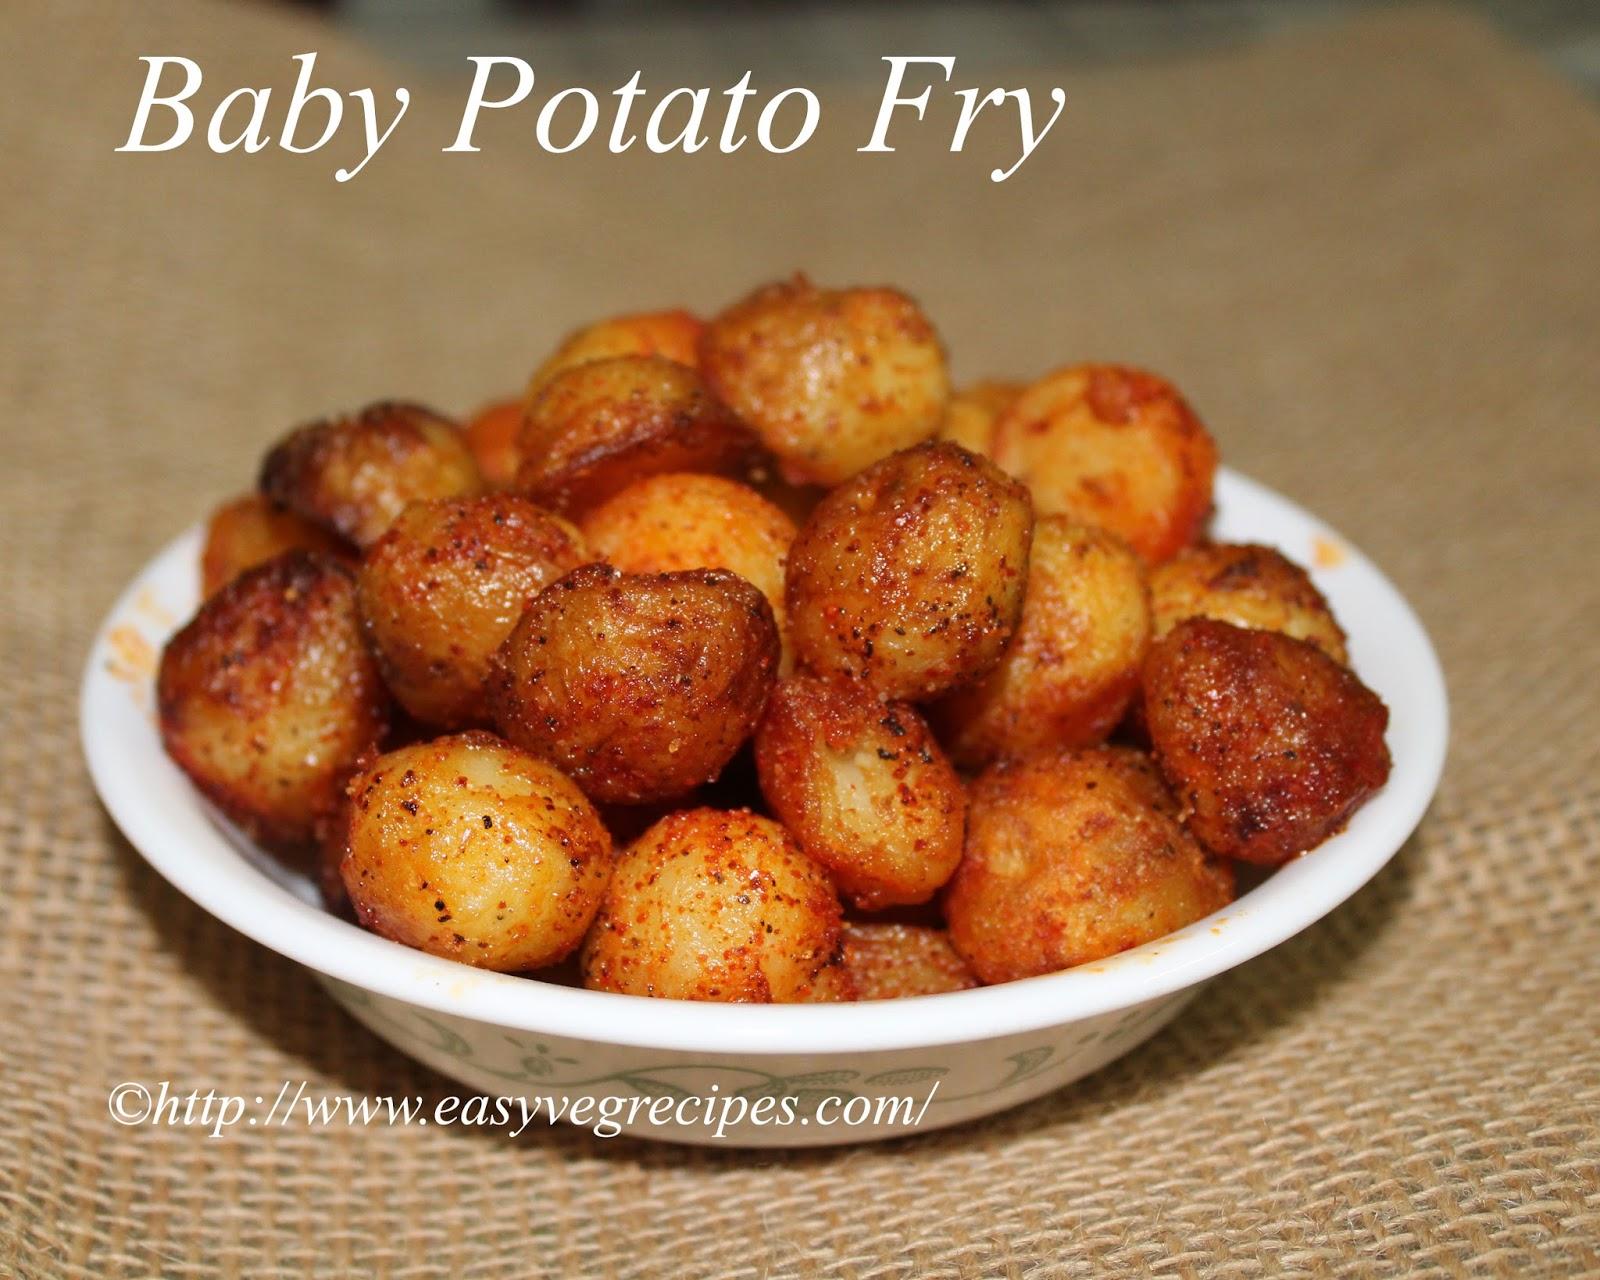 Baby Potato Fry